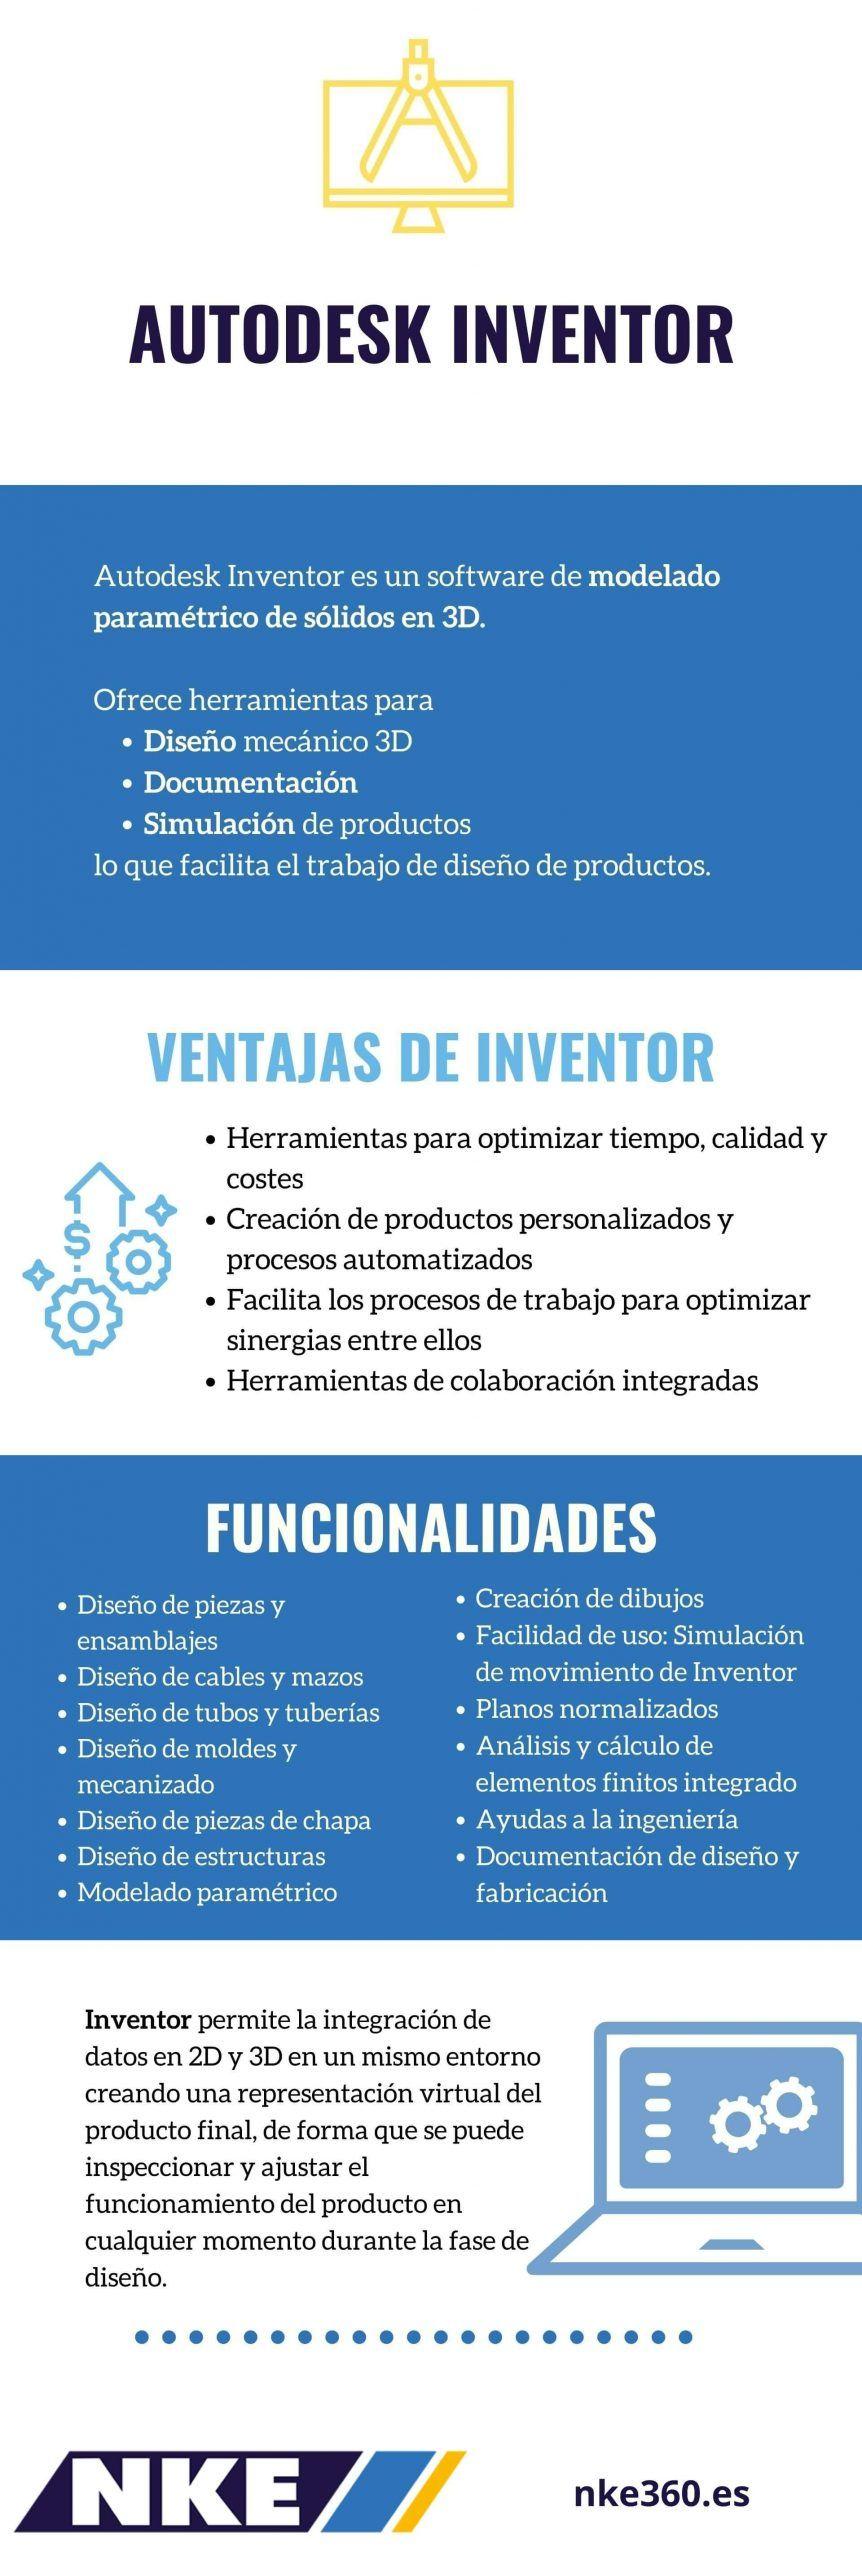 infografia-autodesk-inventor-que-es